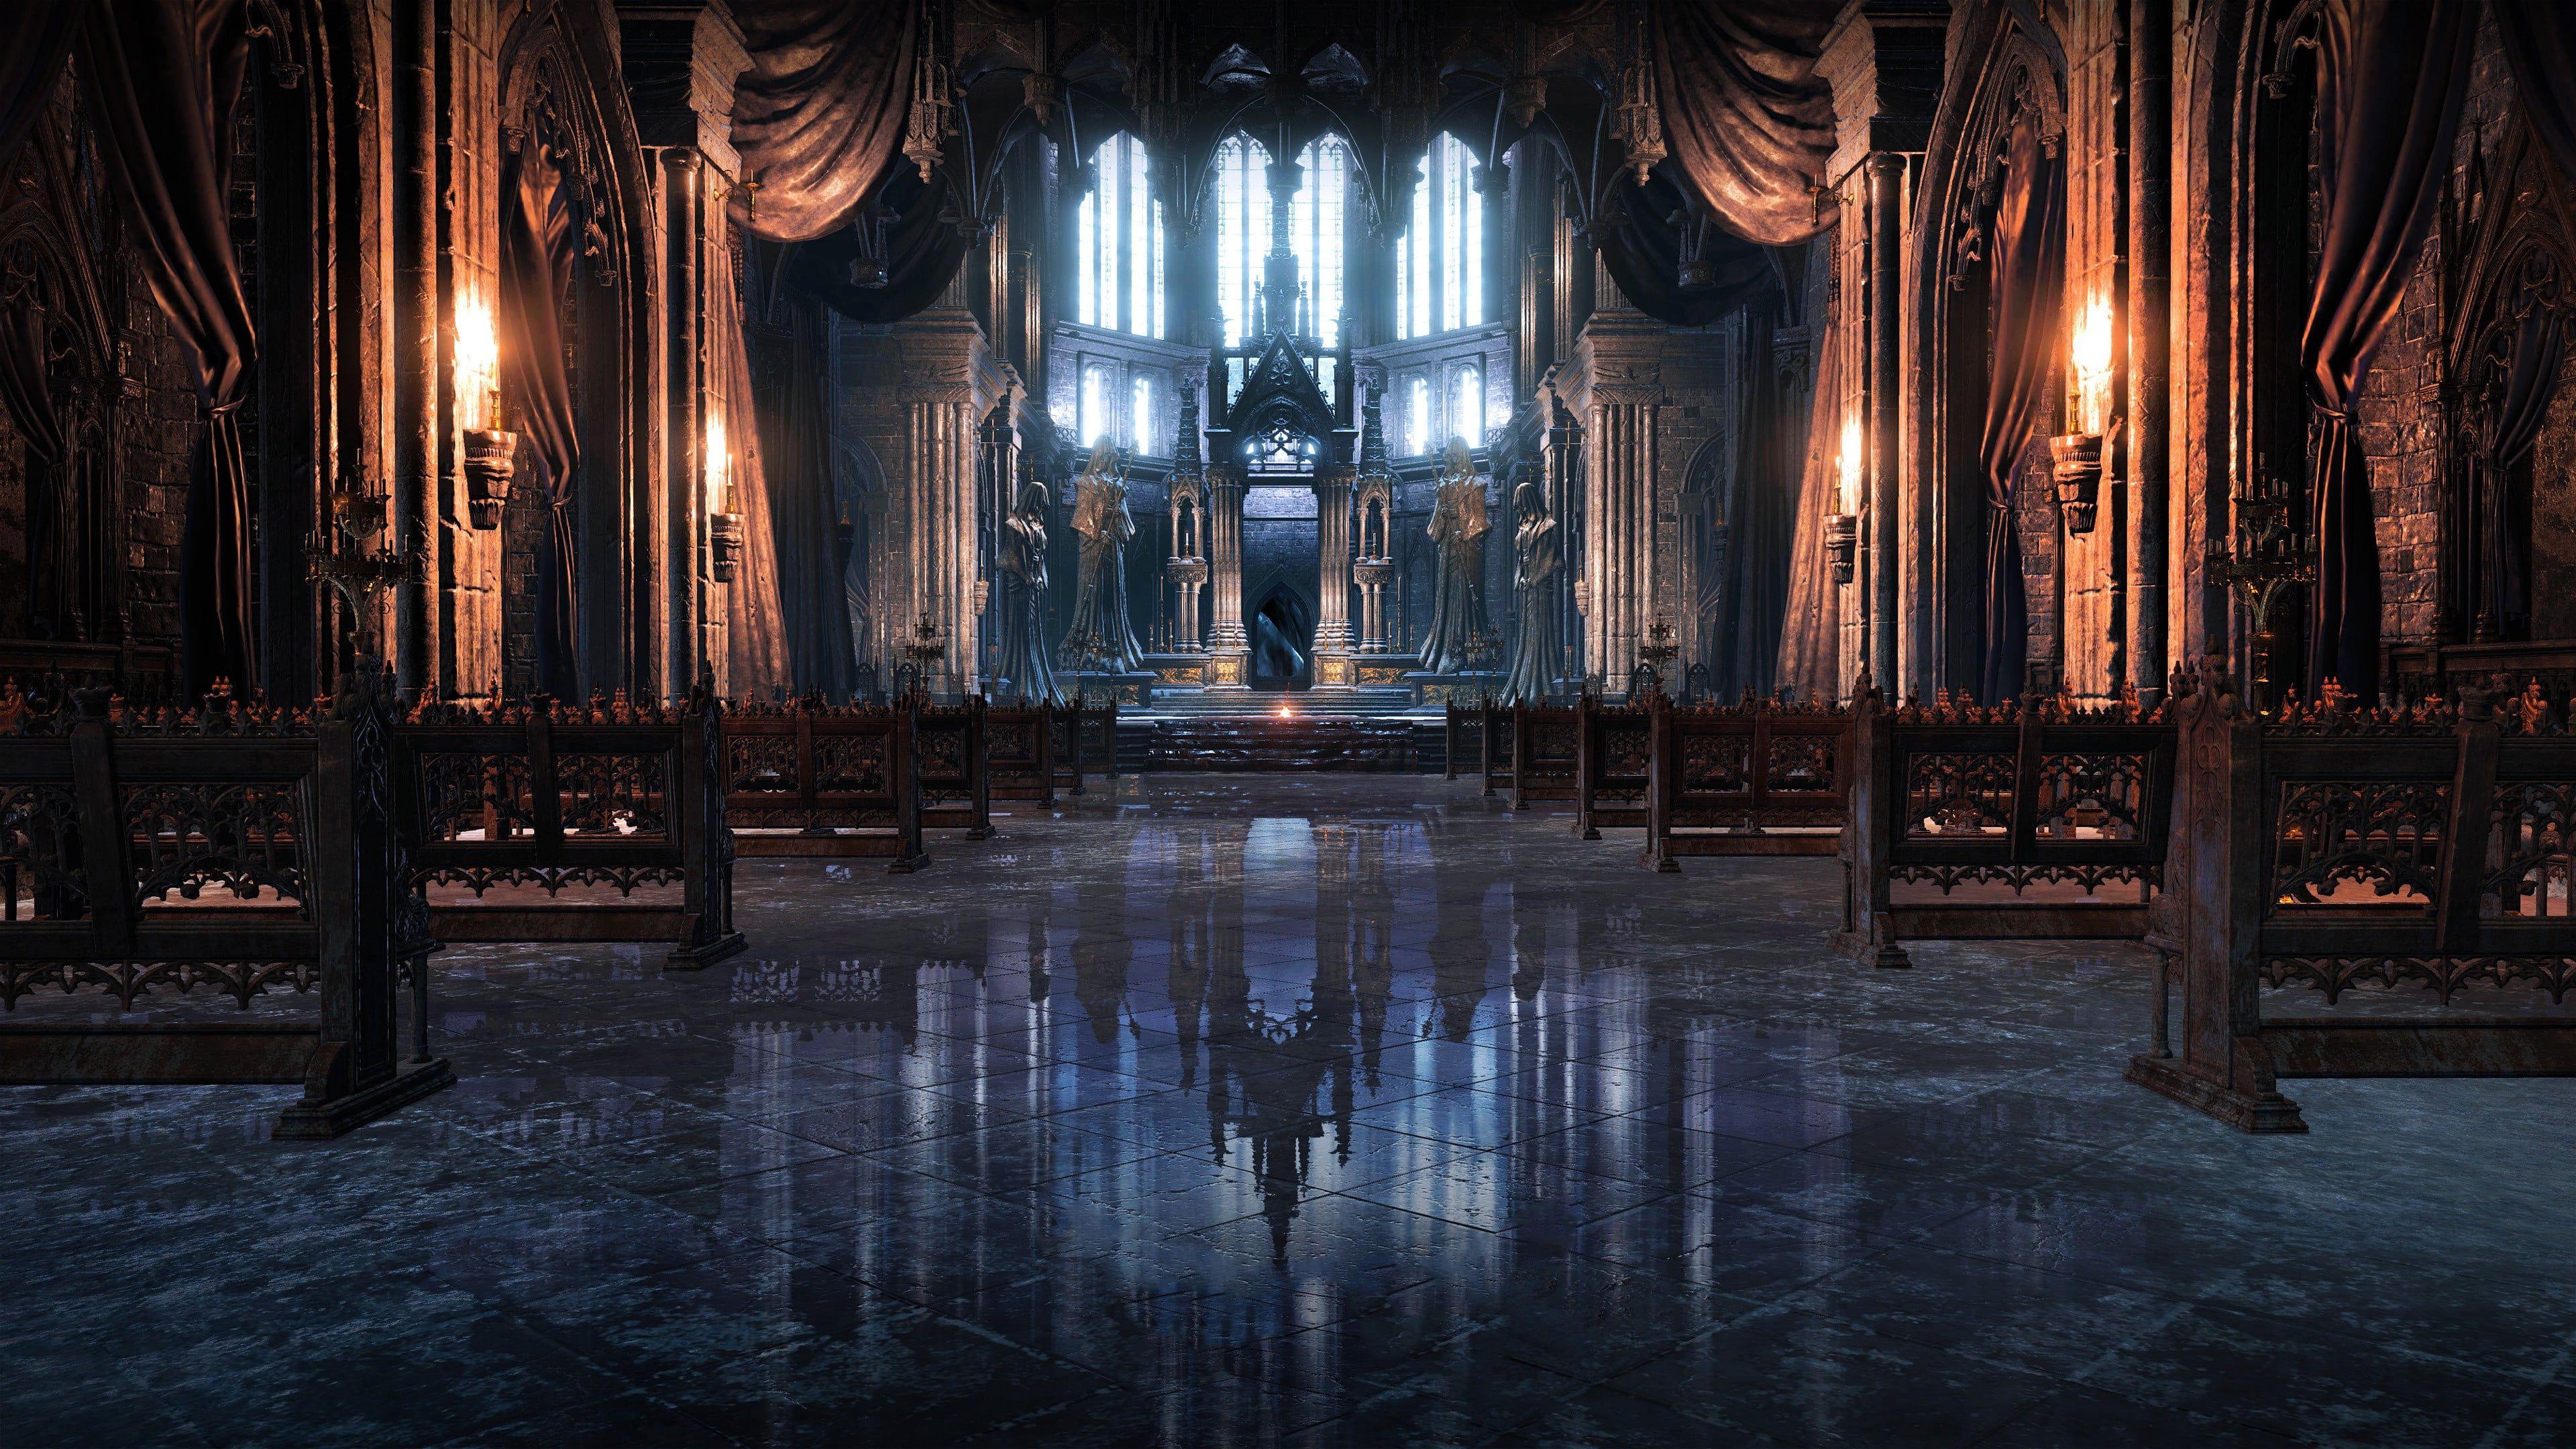 Cathedral Interior Wallpaper Dark Souls Dark Souls Iii Video Games Cathedral Irithyll 4k Wallpaper Hdwall In 2020 Dark Souls Landscape Wallpaper Fantasy Landscape